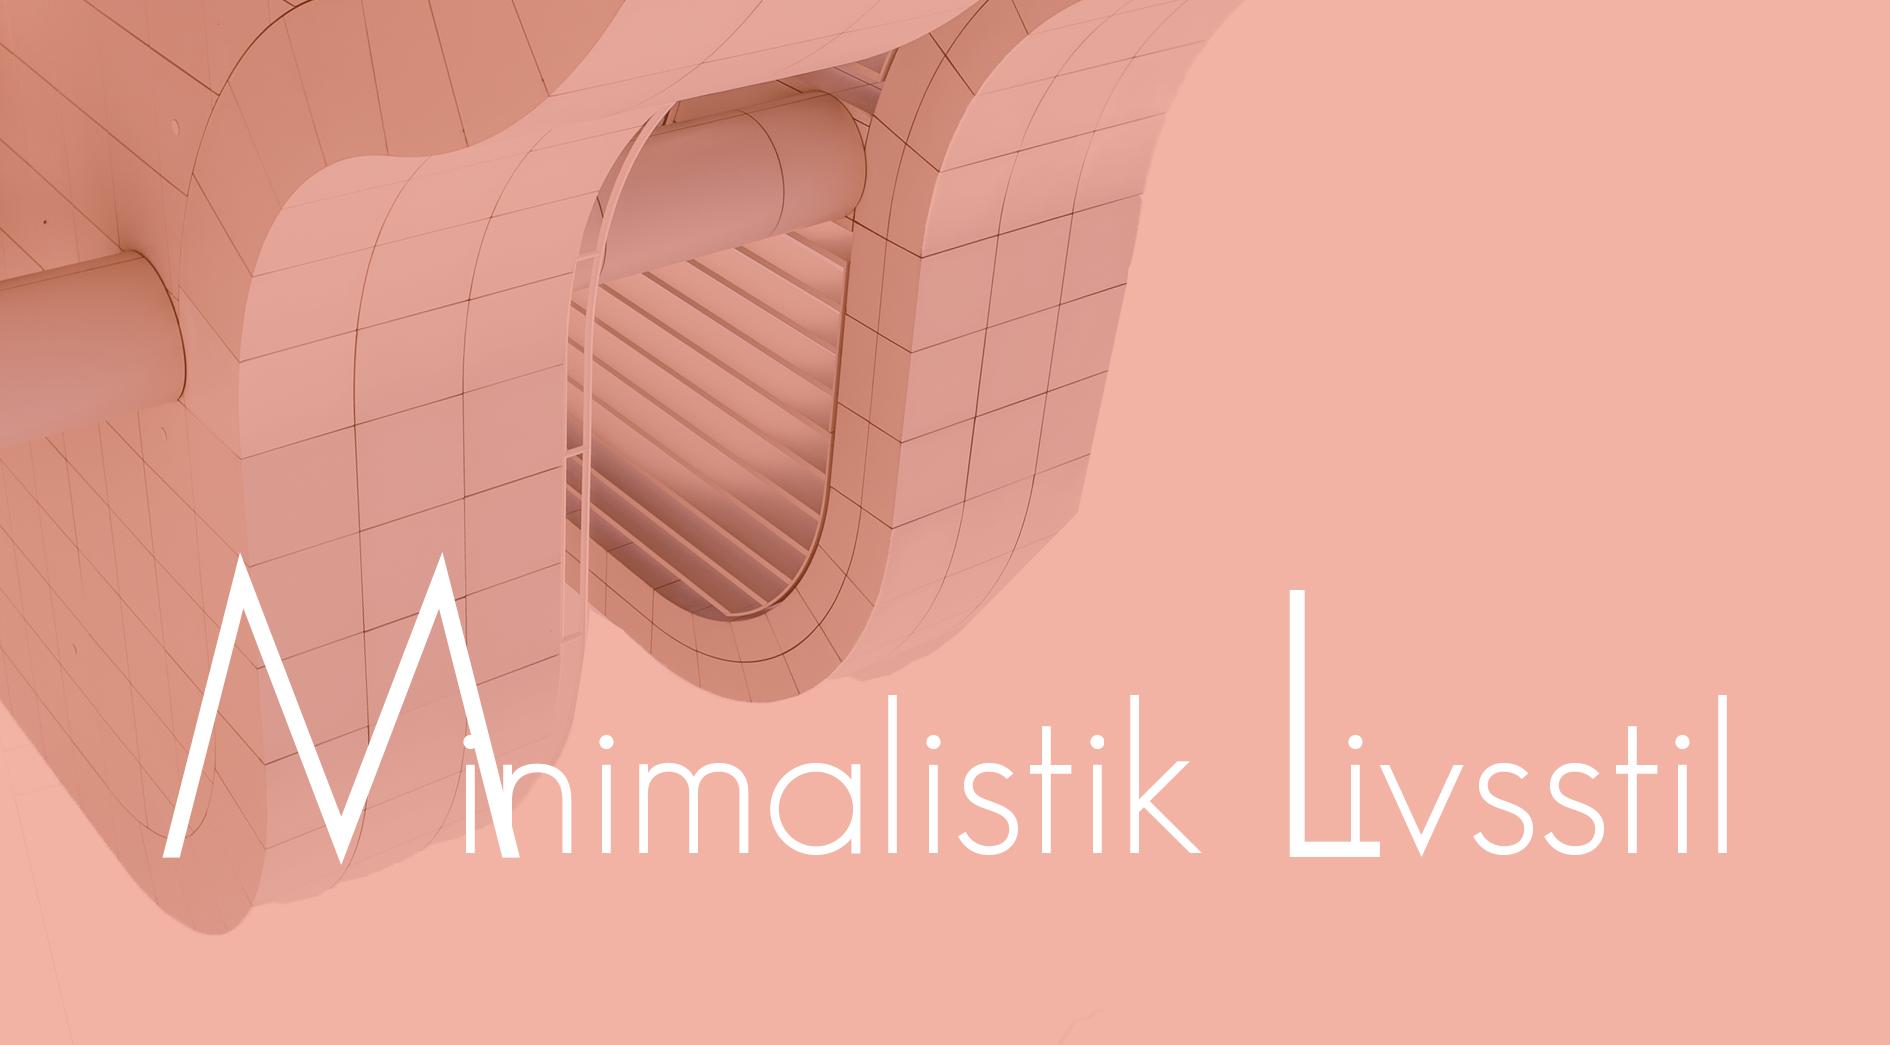 Minimalistik livsstil